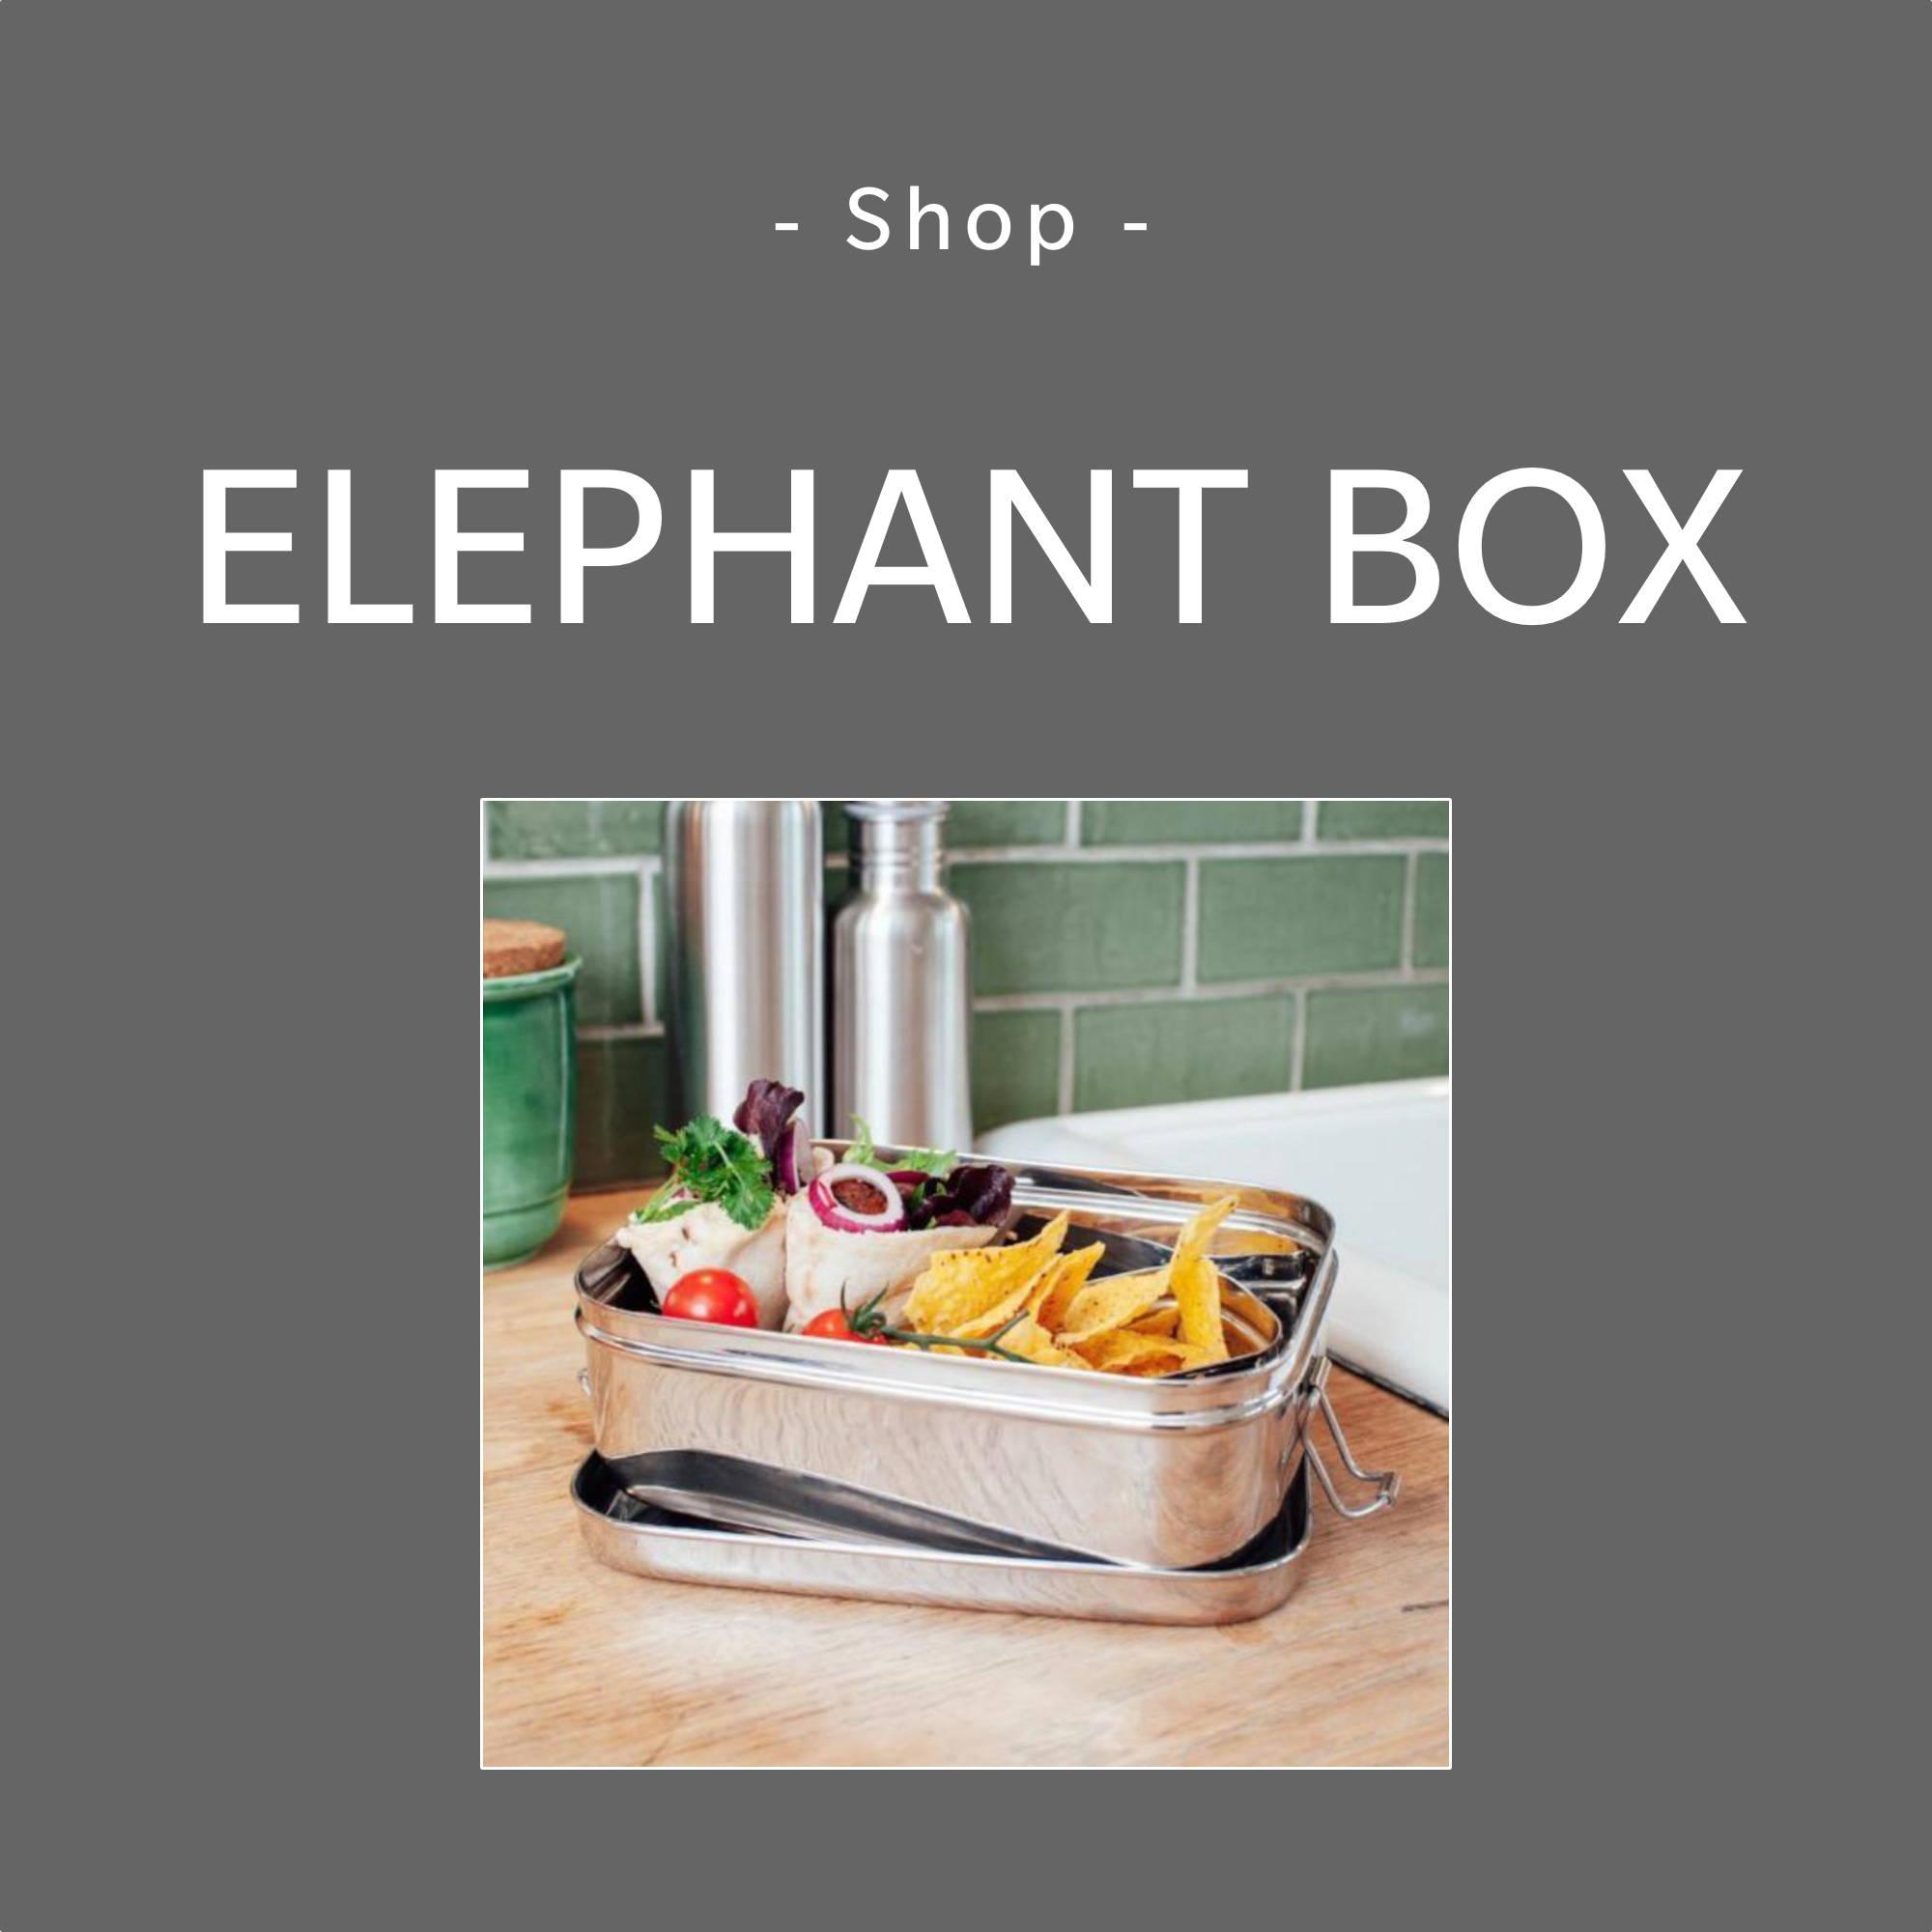 Elephant Box Brand Page